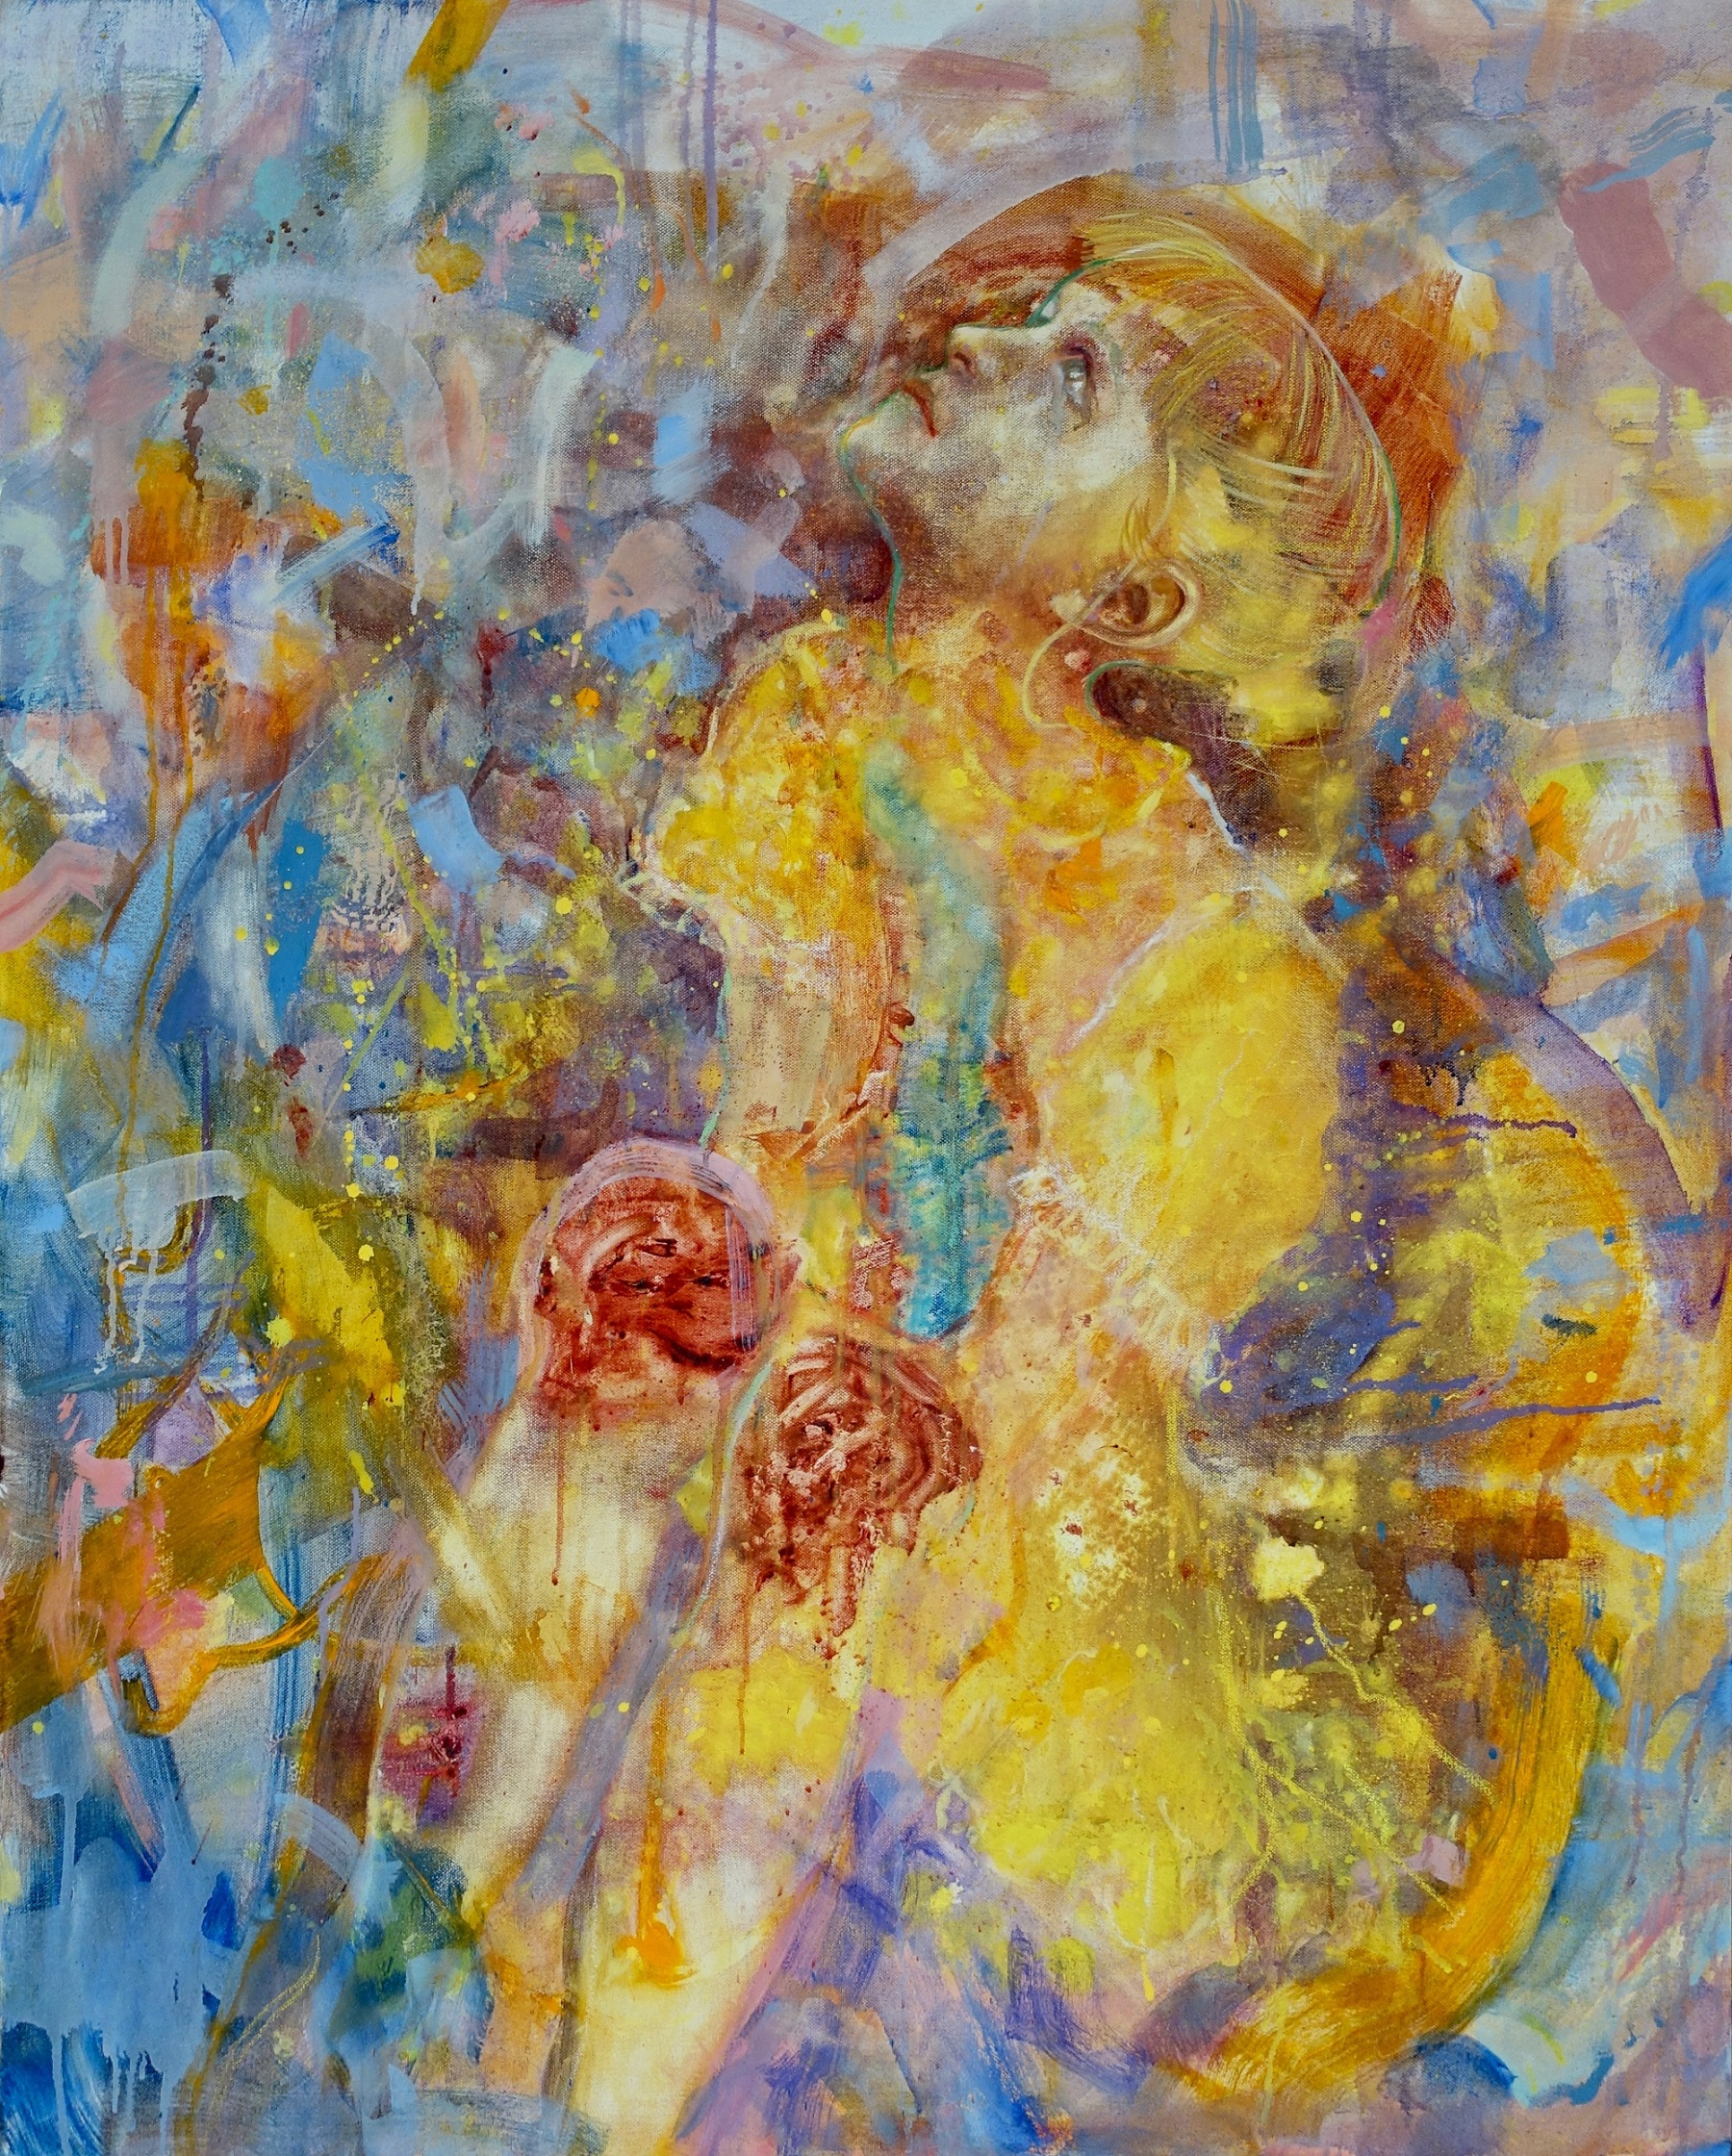 The playground, 2019 Jennifer Nieuwland Oil on canvas, 100 x 80 cm